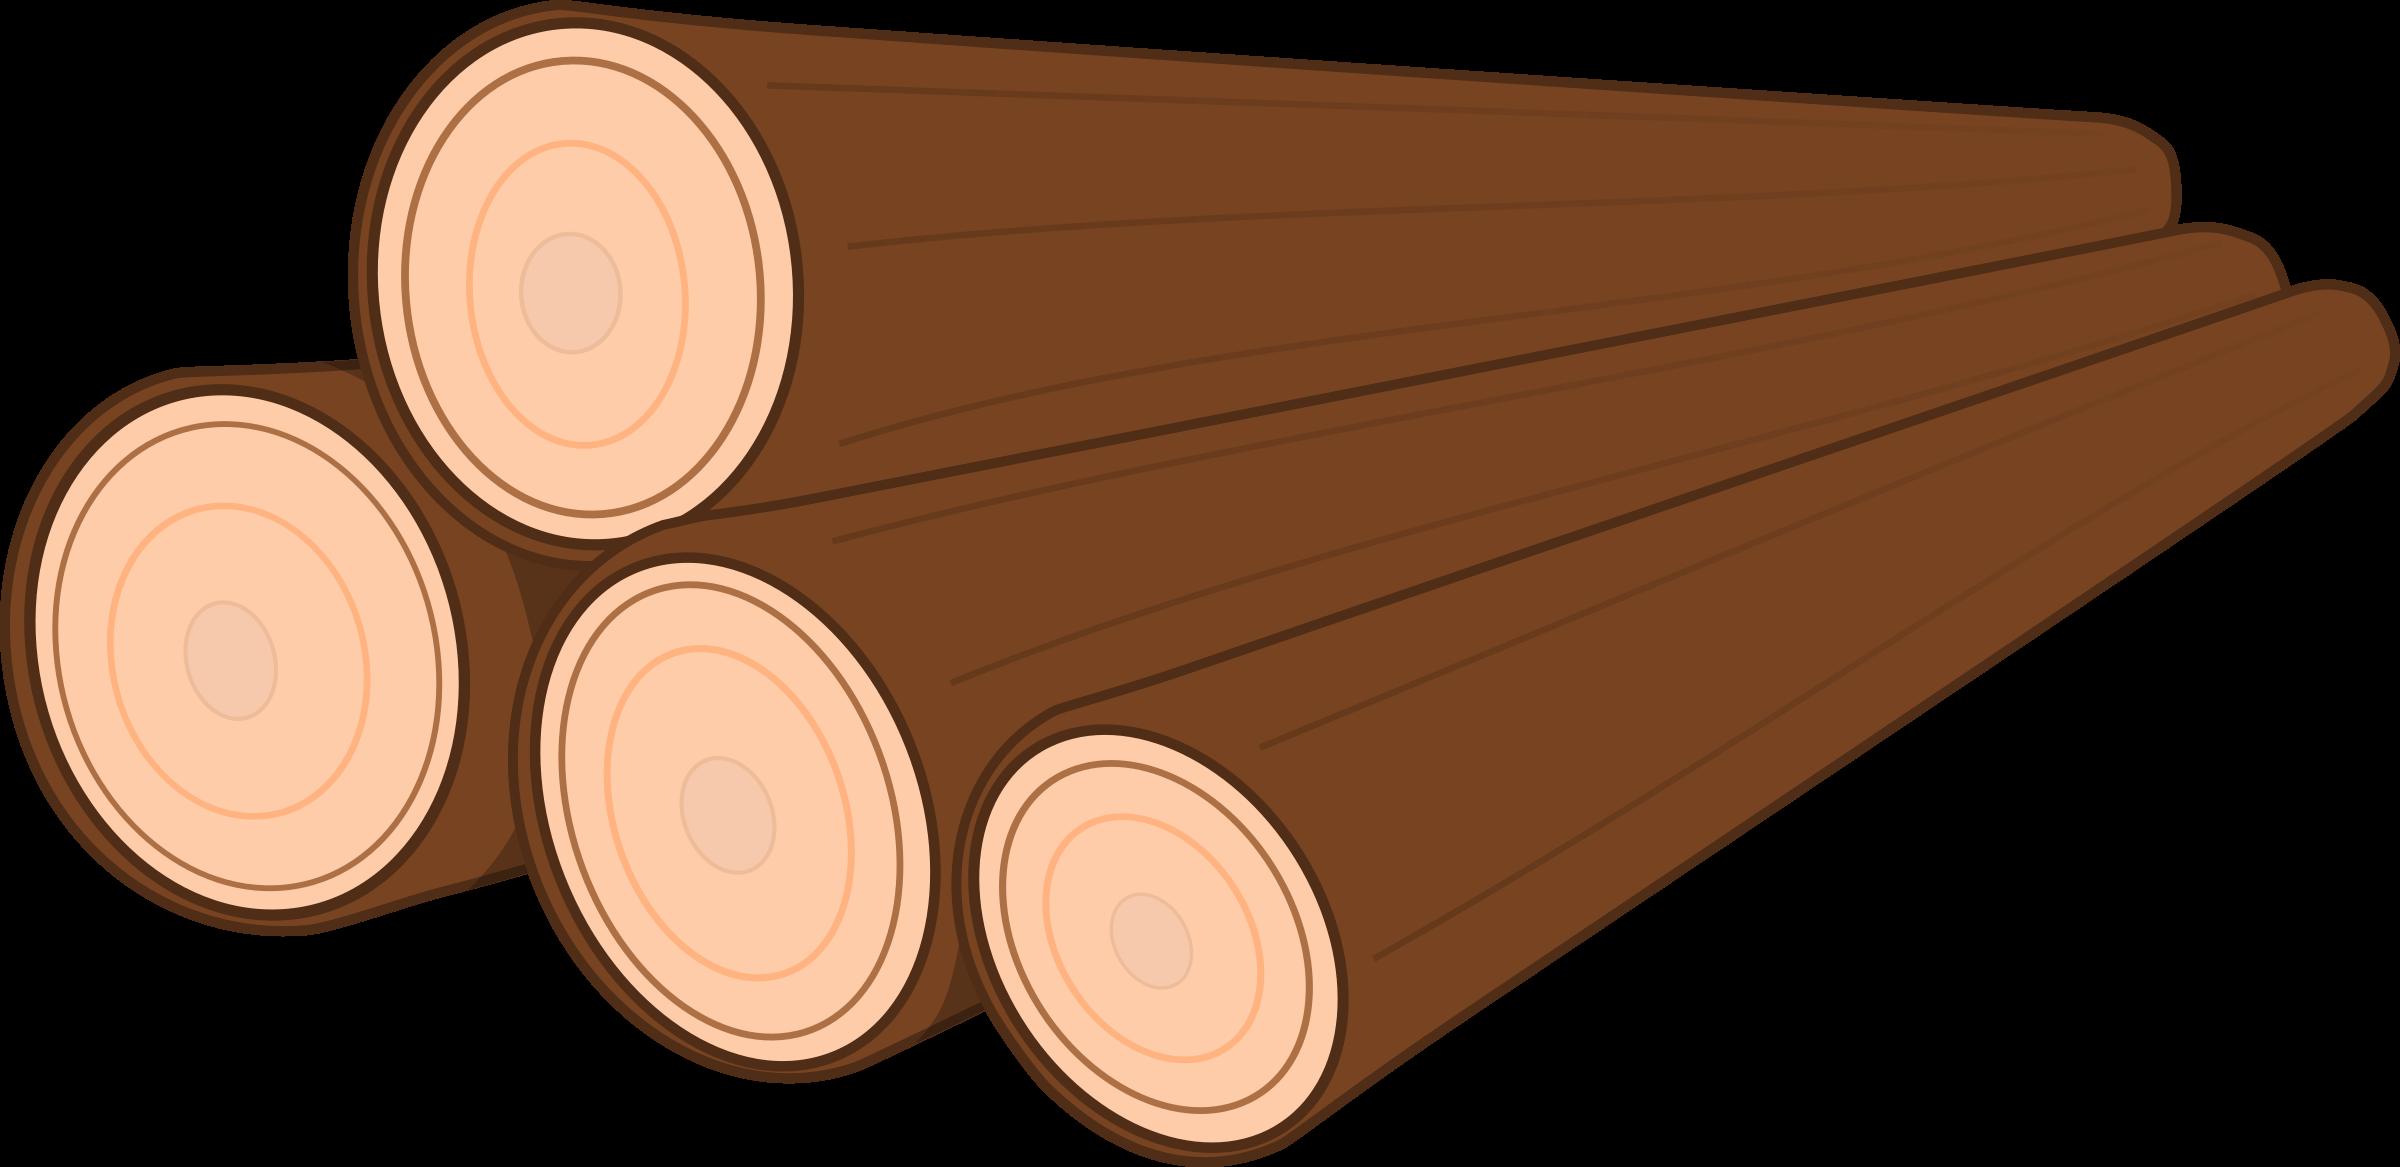 Lumber image group wood. Lumberjack clipart woodcutter